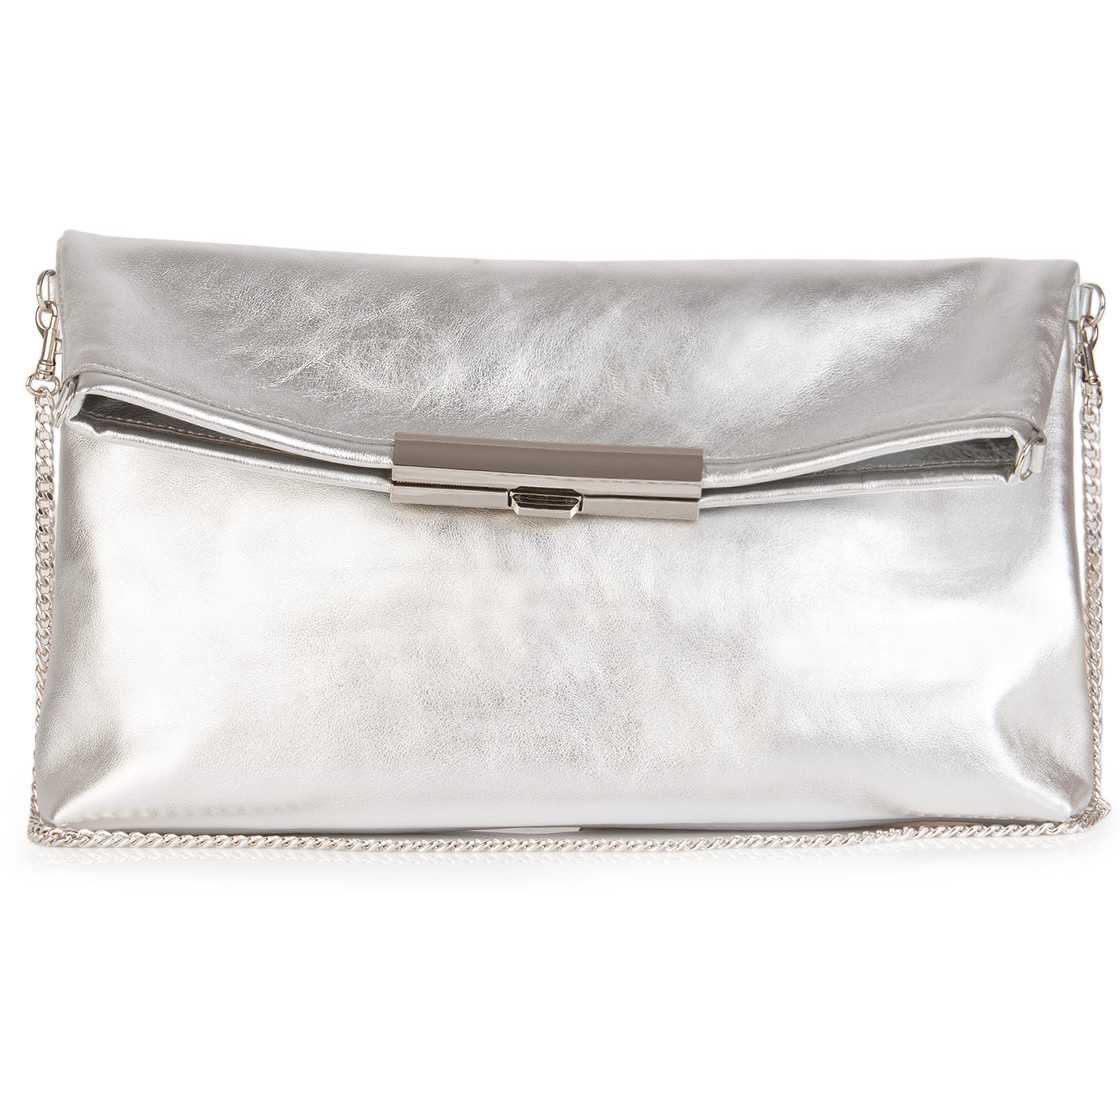 Plic argintiu din piele naturala model ZUK03